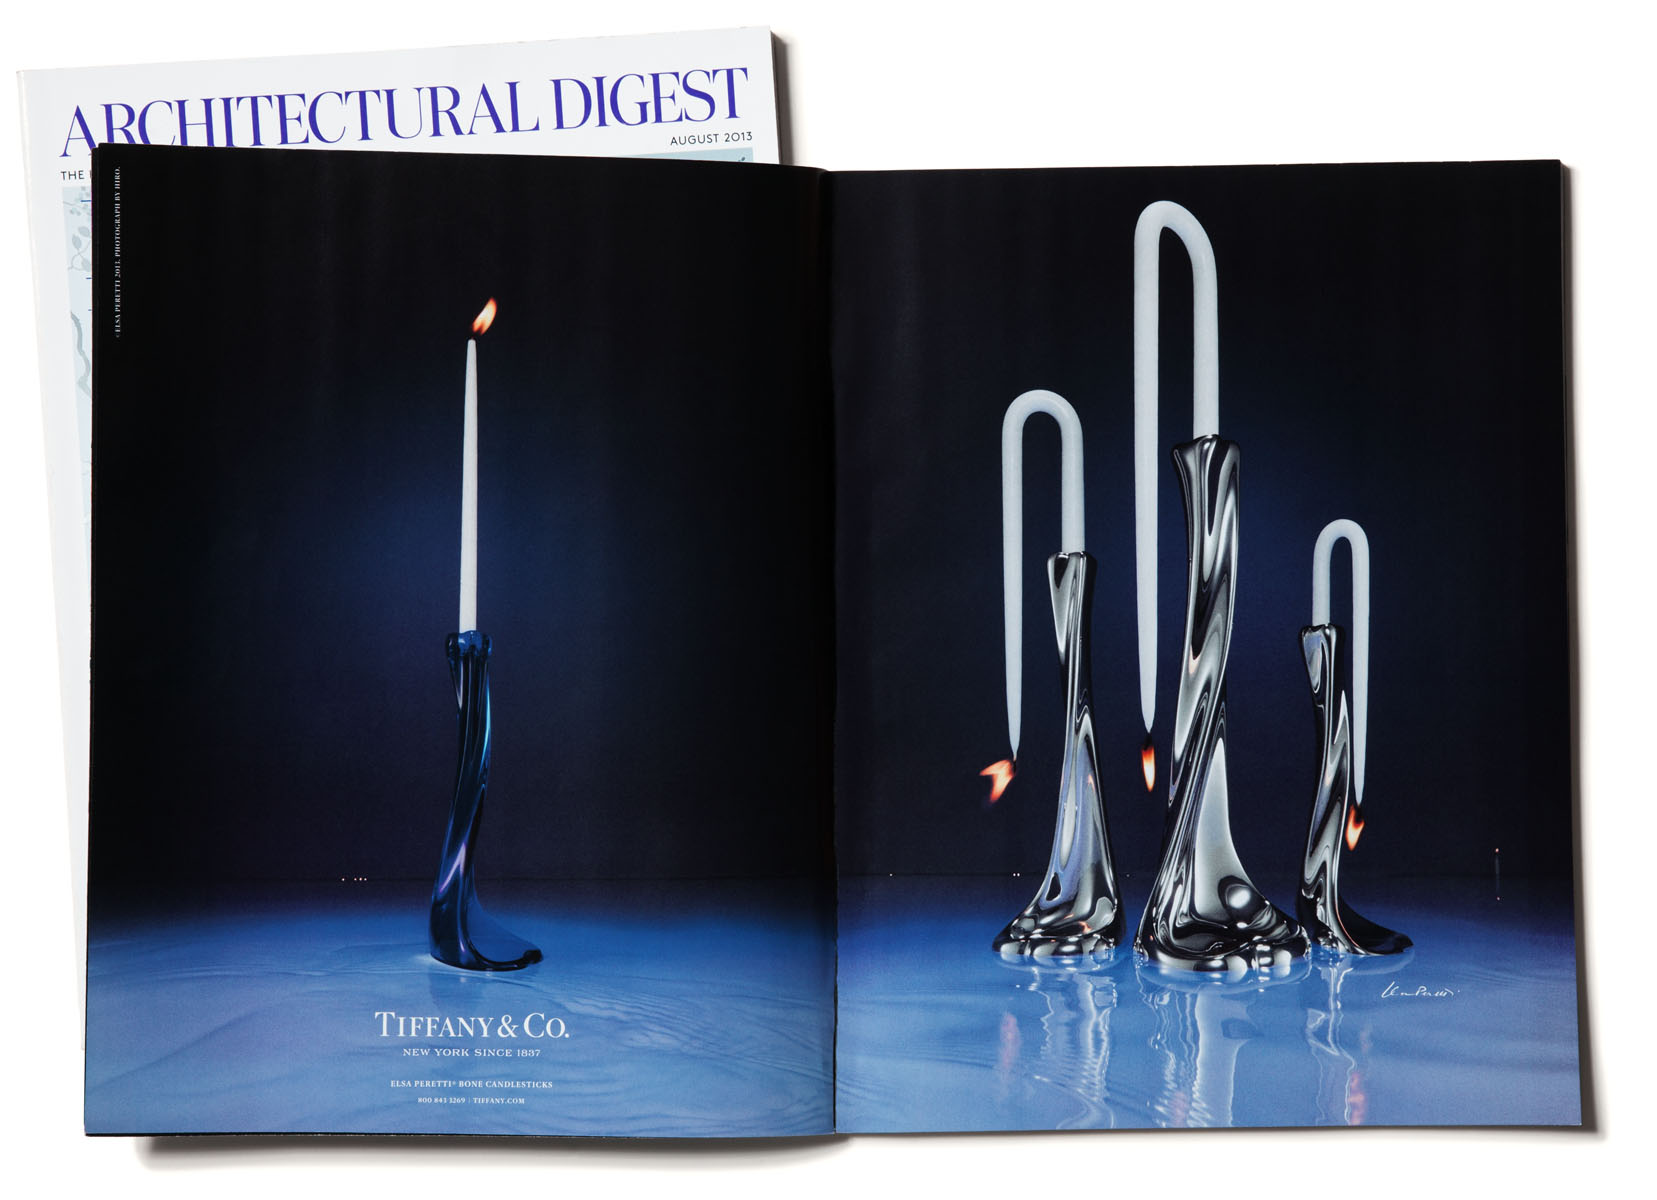 Elsa Peretti Candlesticks, Image By Hiro, 2012